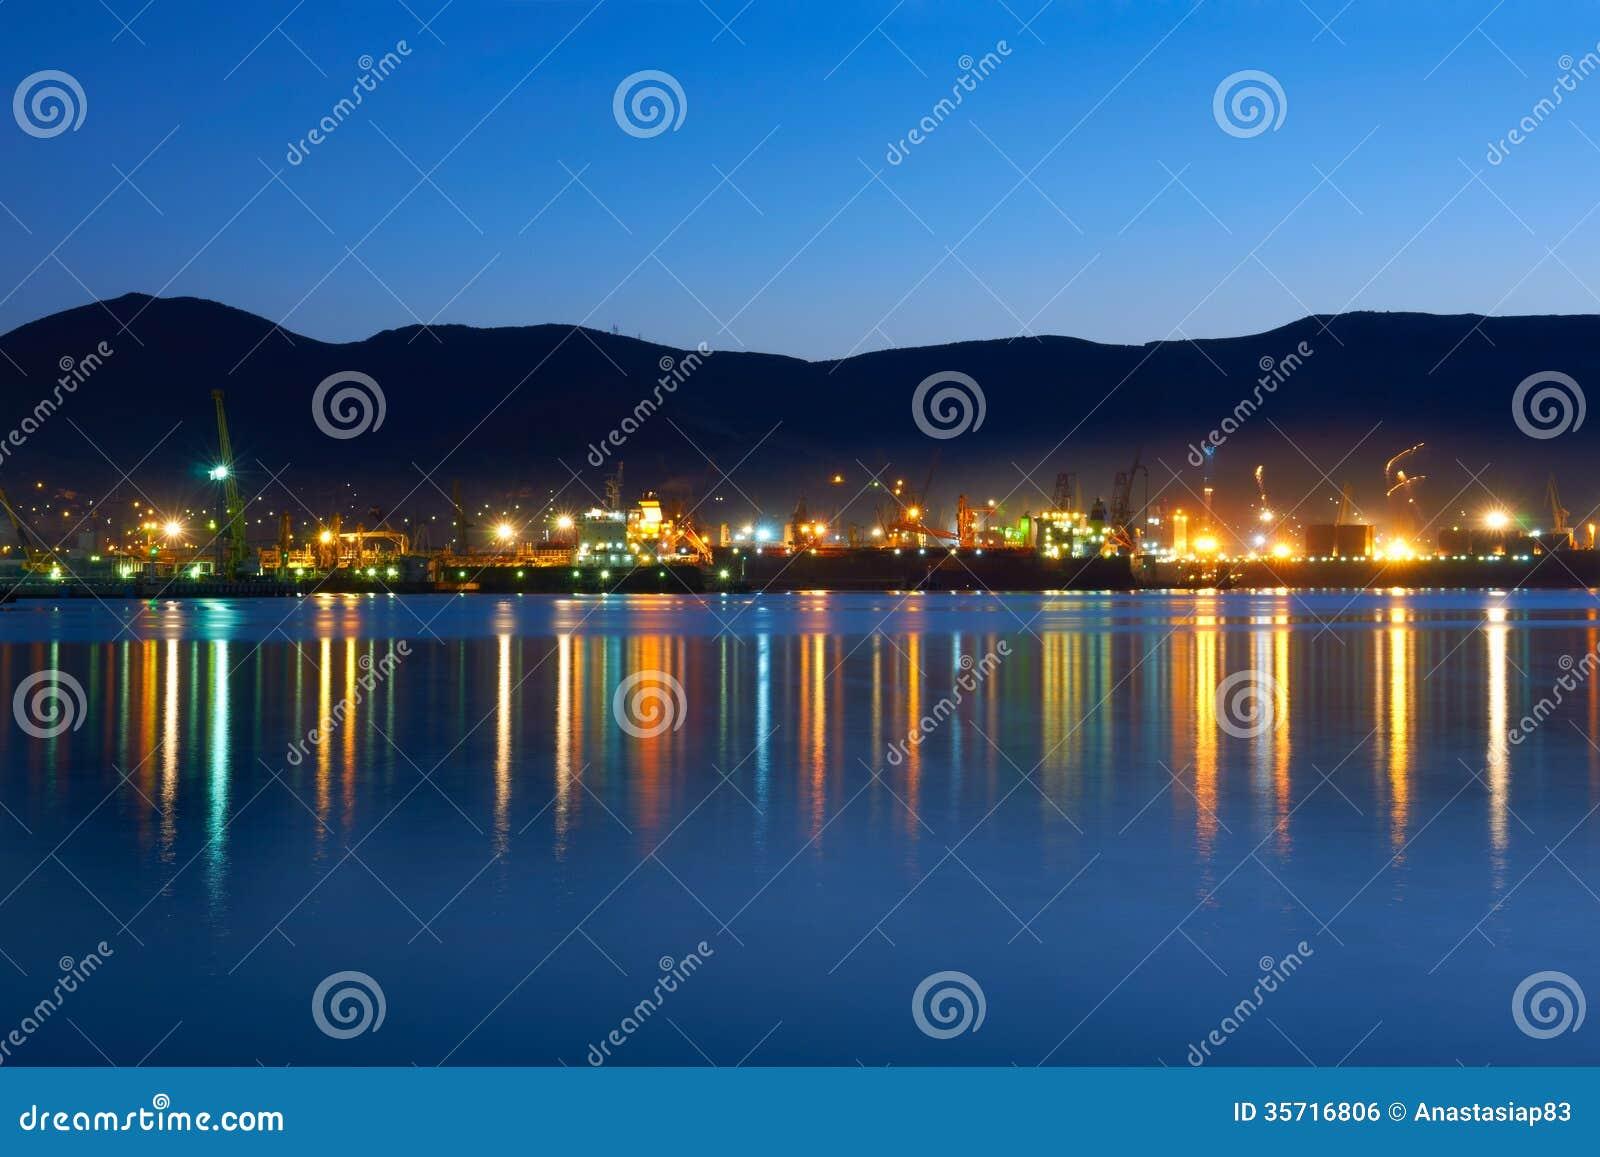 Industry city at night